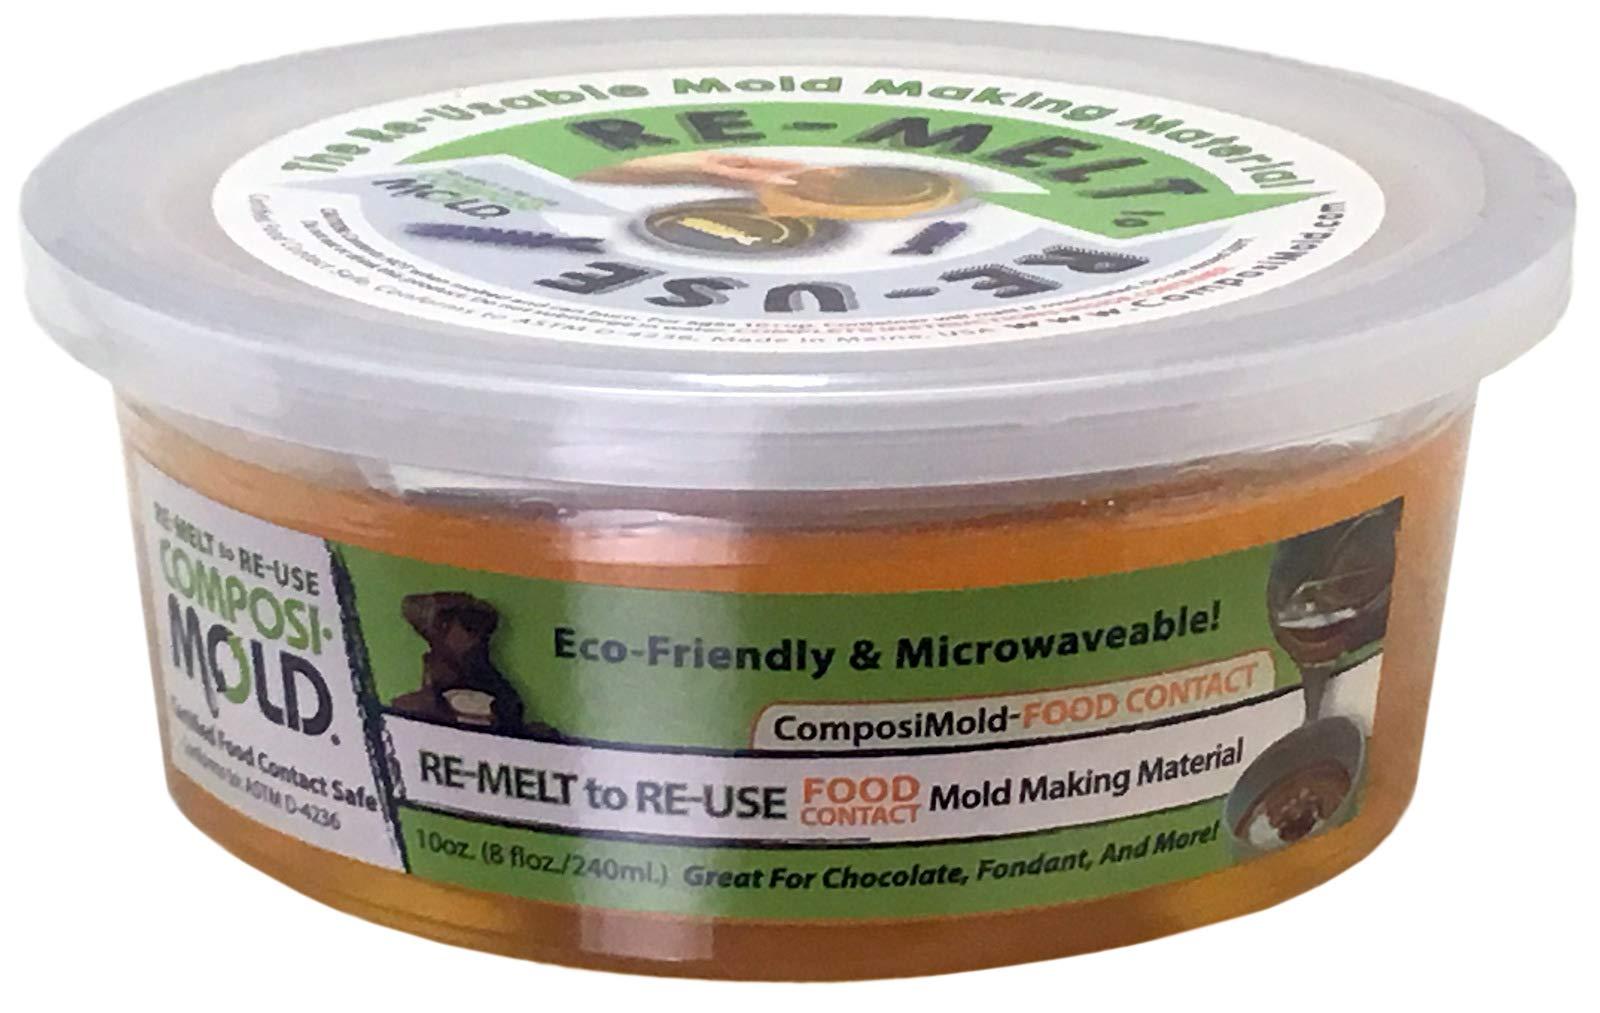 ComposiMold Food Contact Safe 10 Ounce. Reusable Molding Material, Re-heat To Re-use